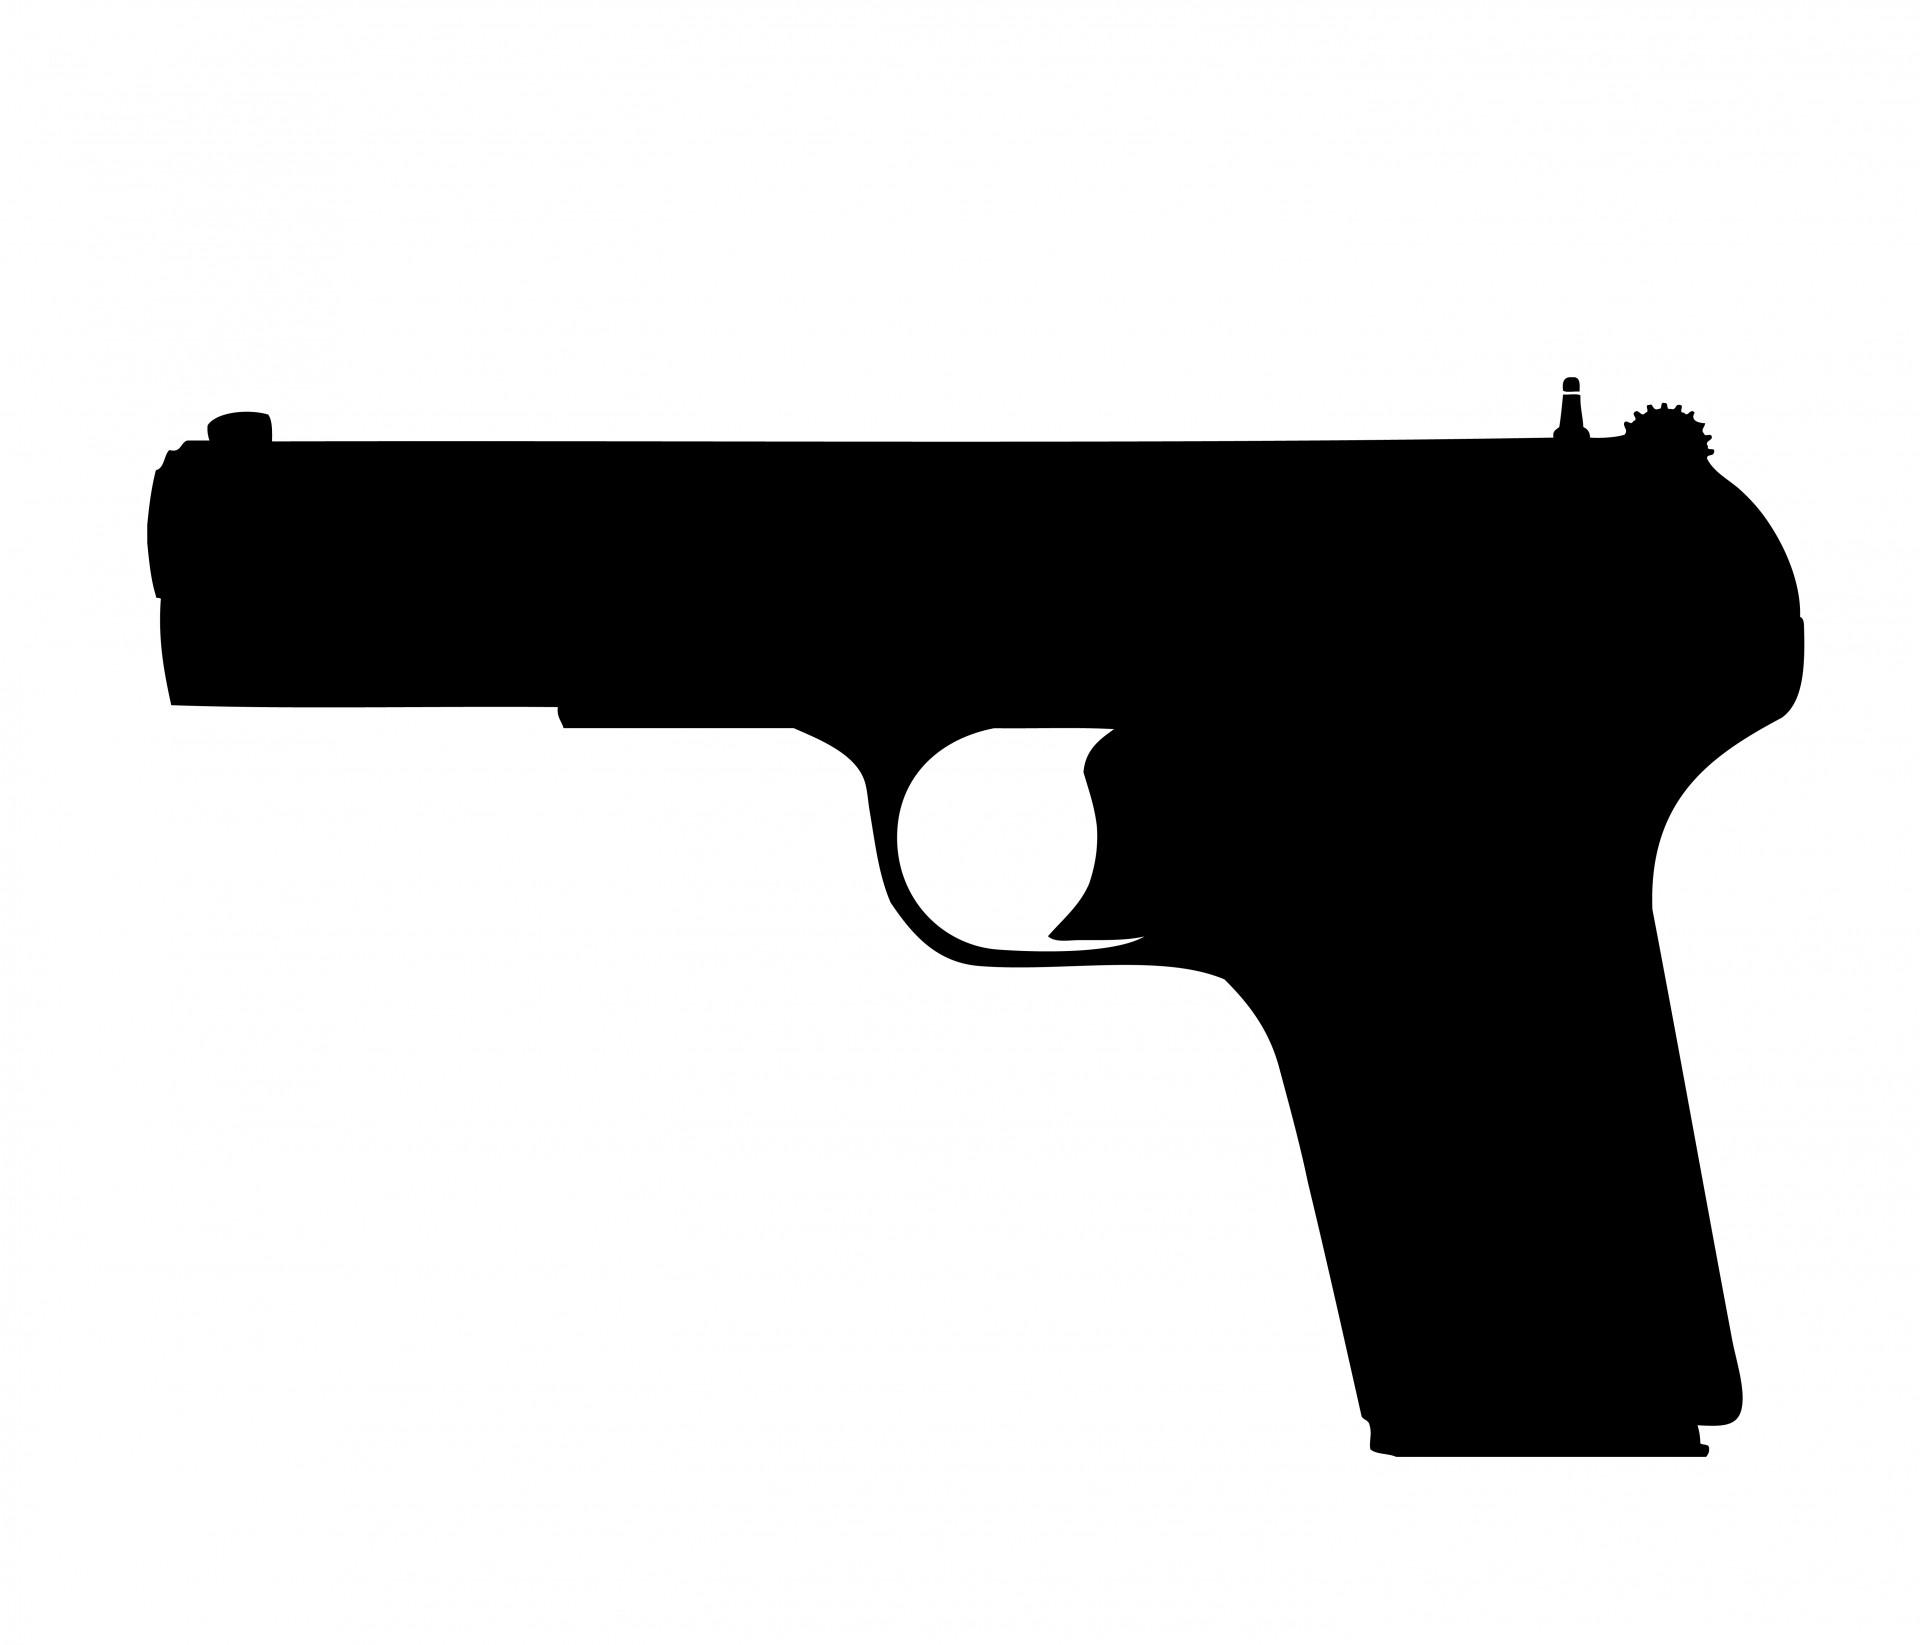 Guns clip art - ClipartFest-Guns clip art - ClipartFest-3